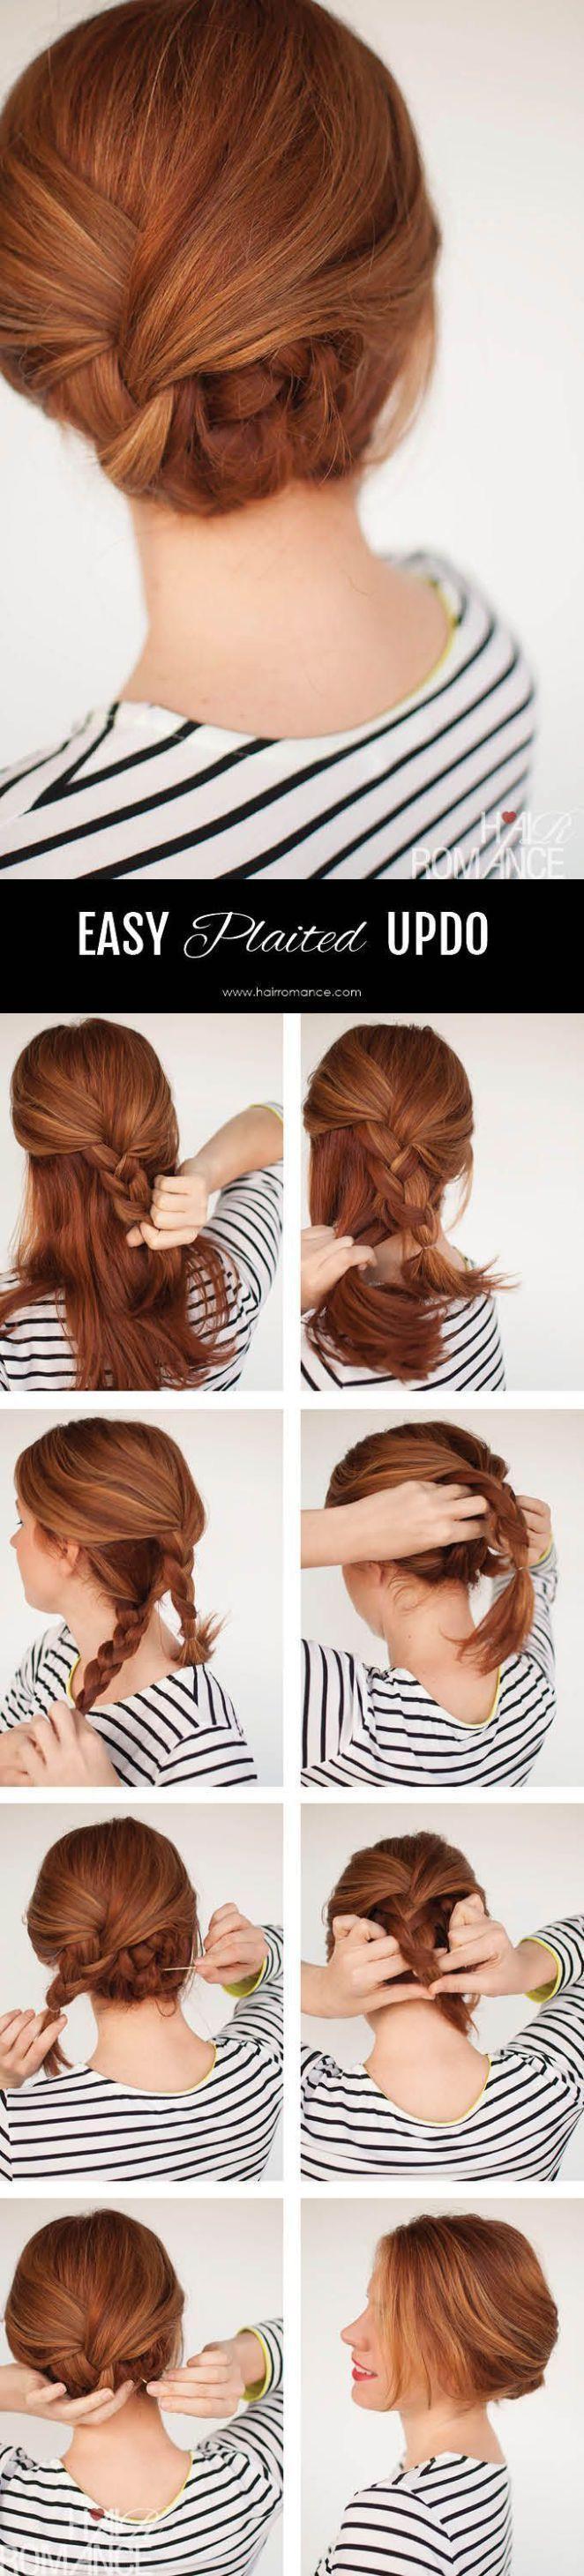 Anfanger Beginner Braided Coi Coiffure Braided Hairstyles Easy Hair Tutorial Five Minute Hairstyles